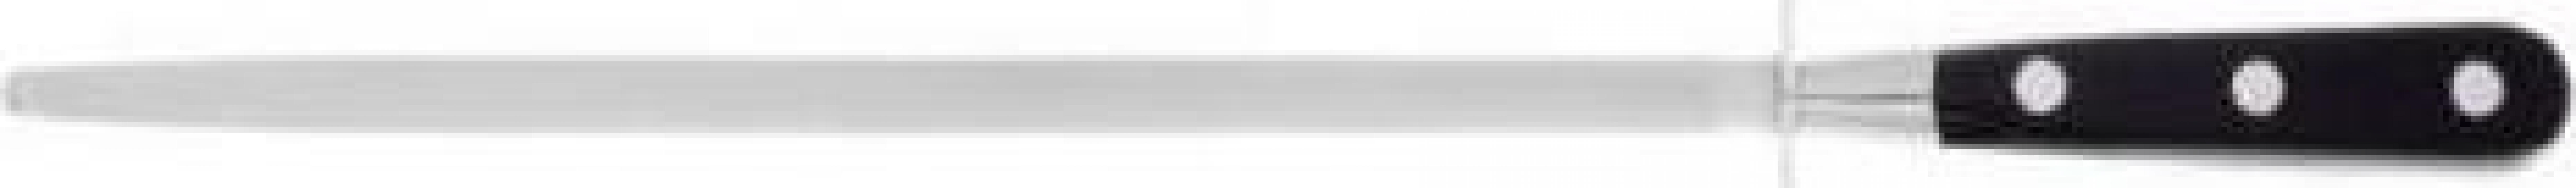 Masat profesional pentru cutite, 30 cm, maner negru